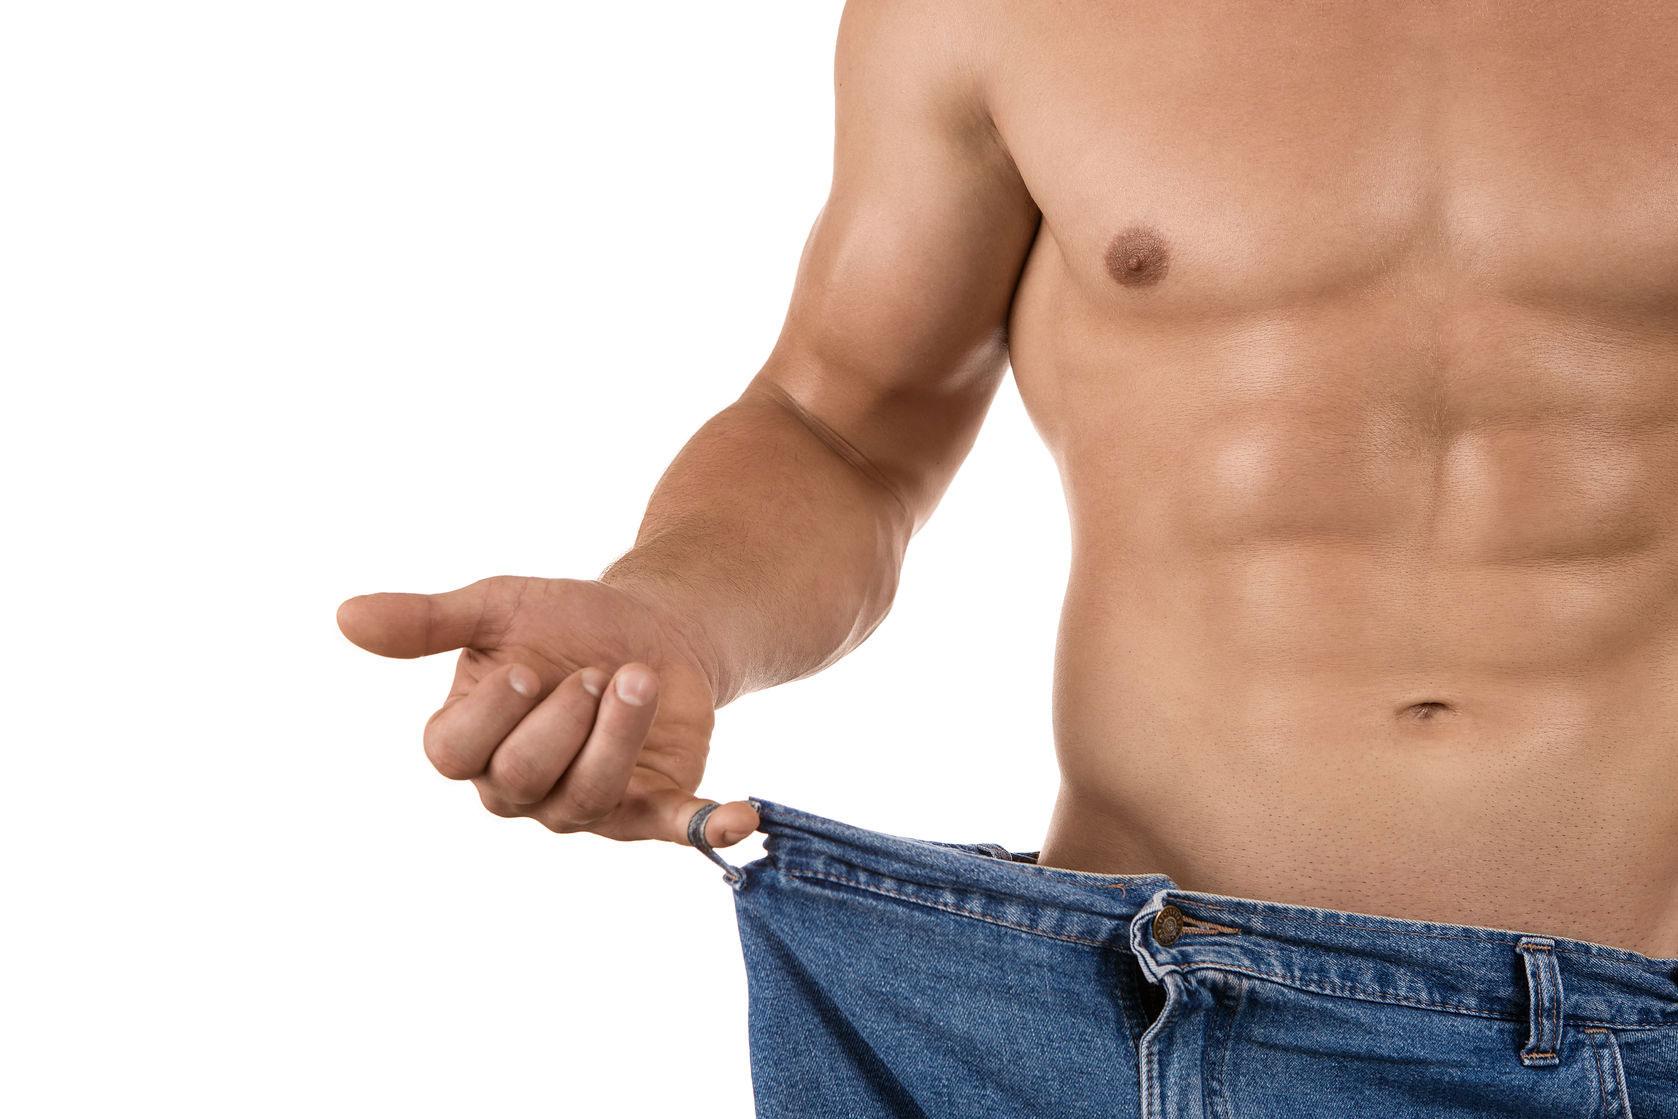 نظام غذائي لانقاص الوزن للرجال